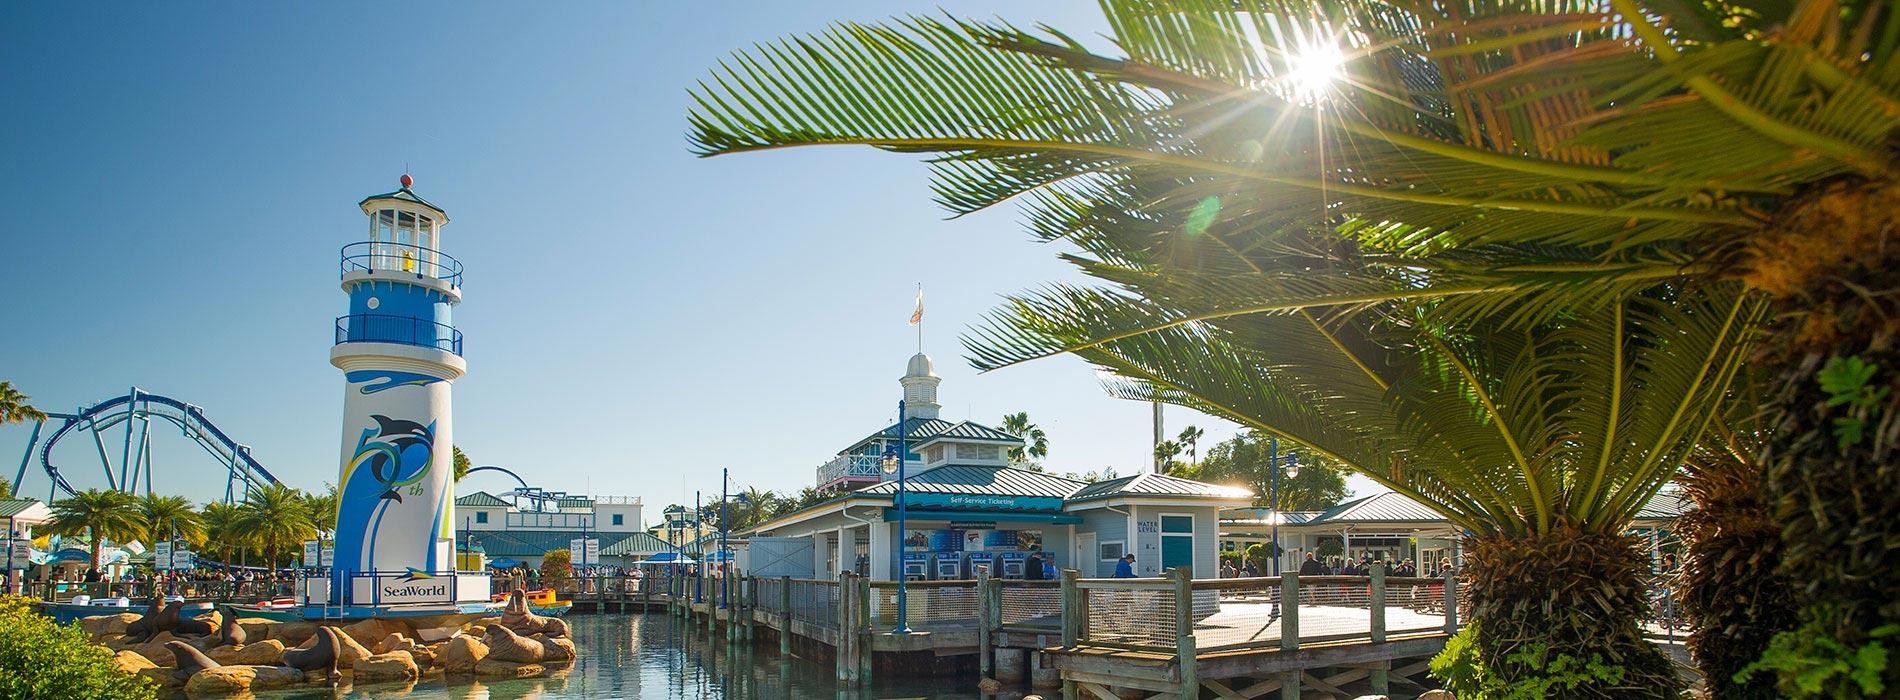 Front entrance of SeaWorld Orlando